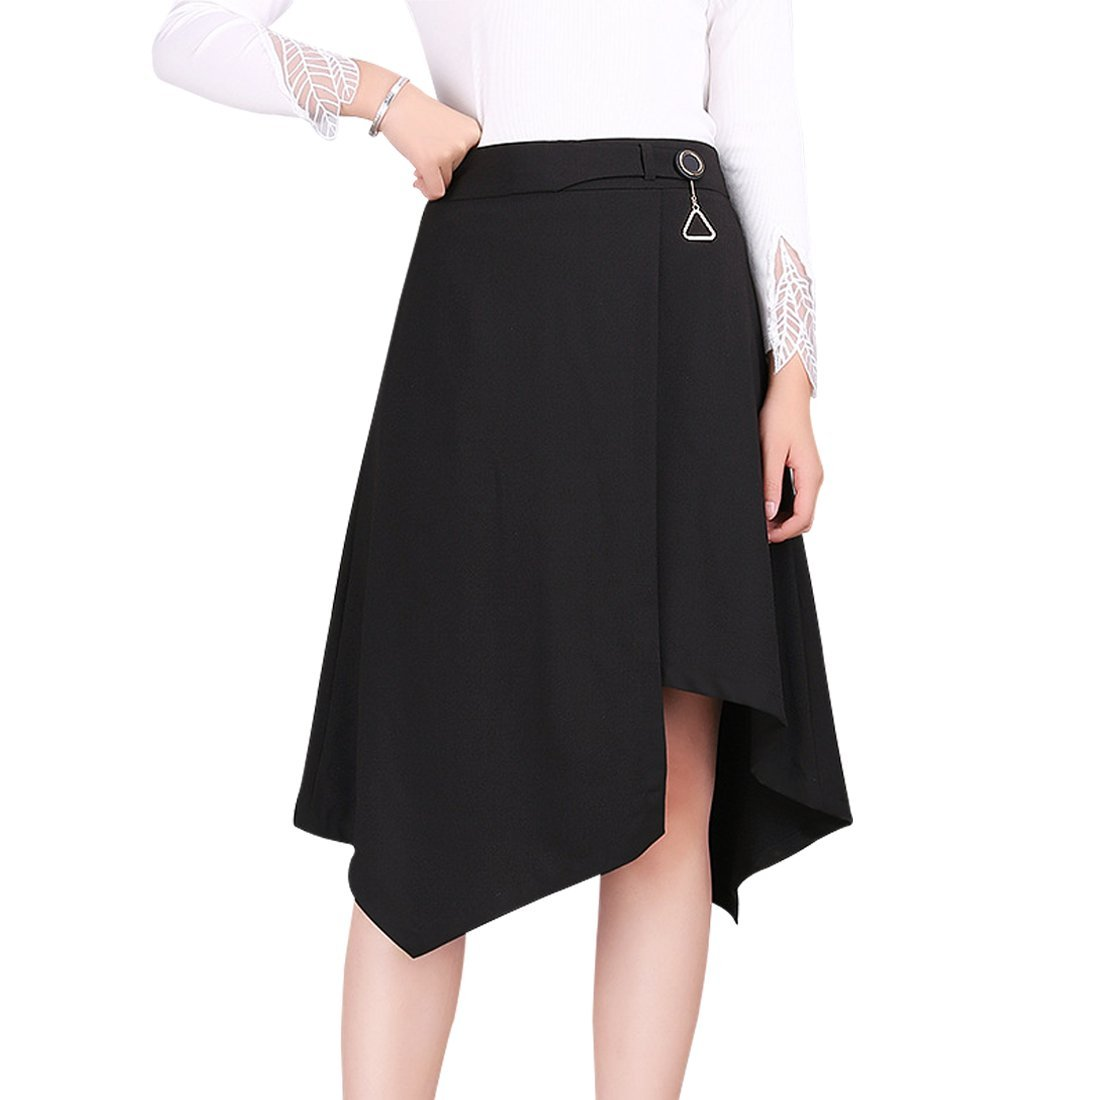 Wincolor Women's Irregular A-line Flared High Waisted Midi Long Skirt Black